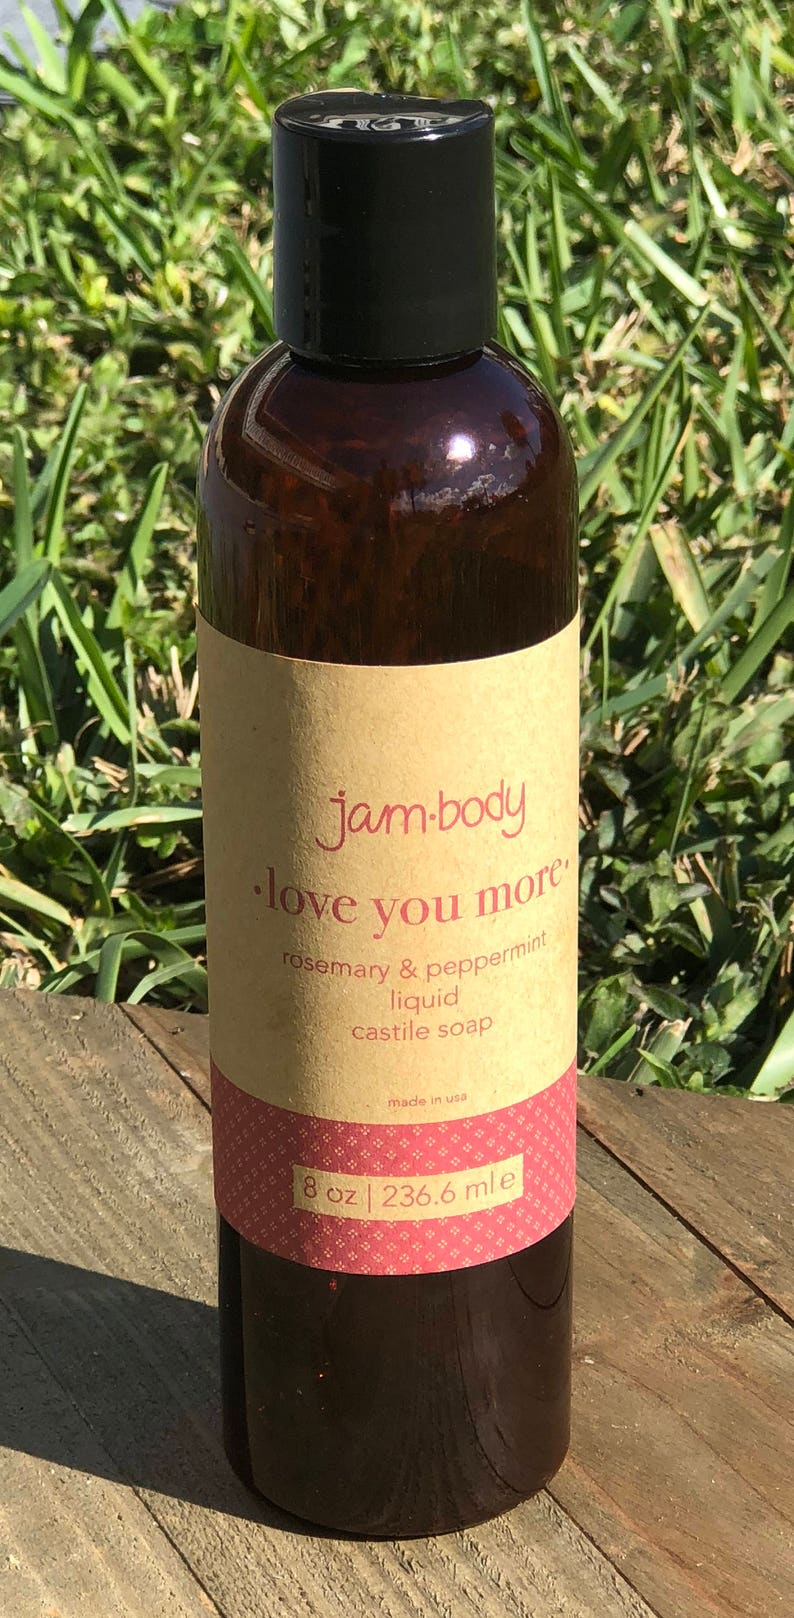 love you more - rosemary & peppermint | liquid castile soap | e  8 oz  /  236 6 ml